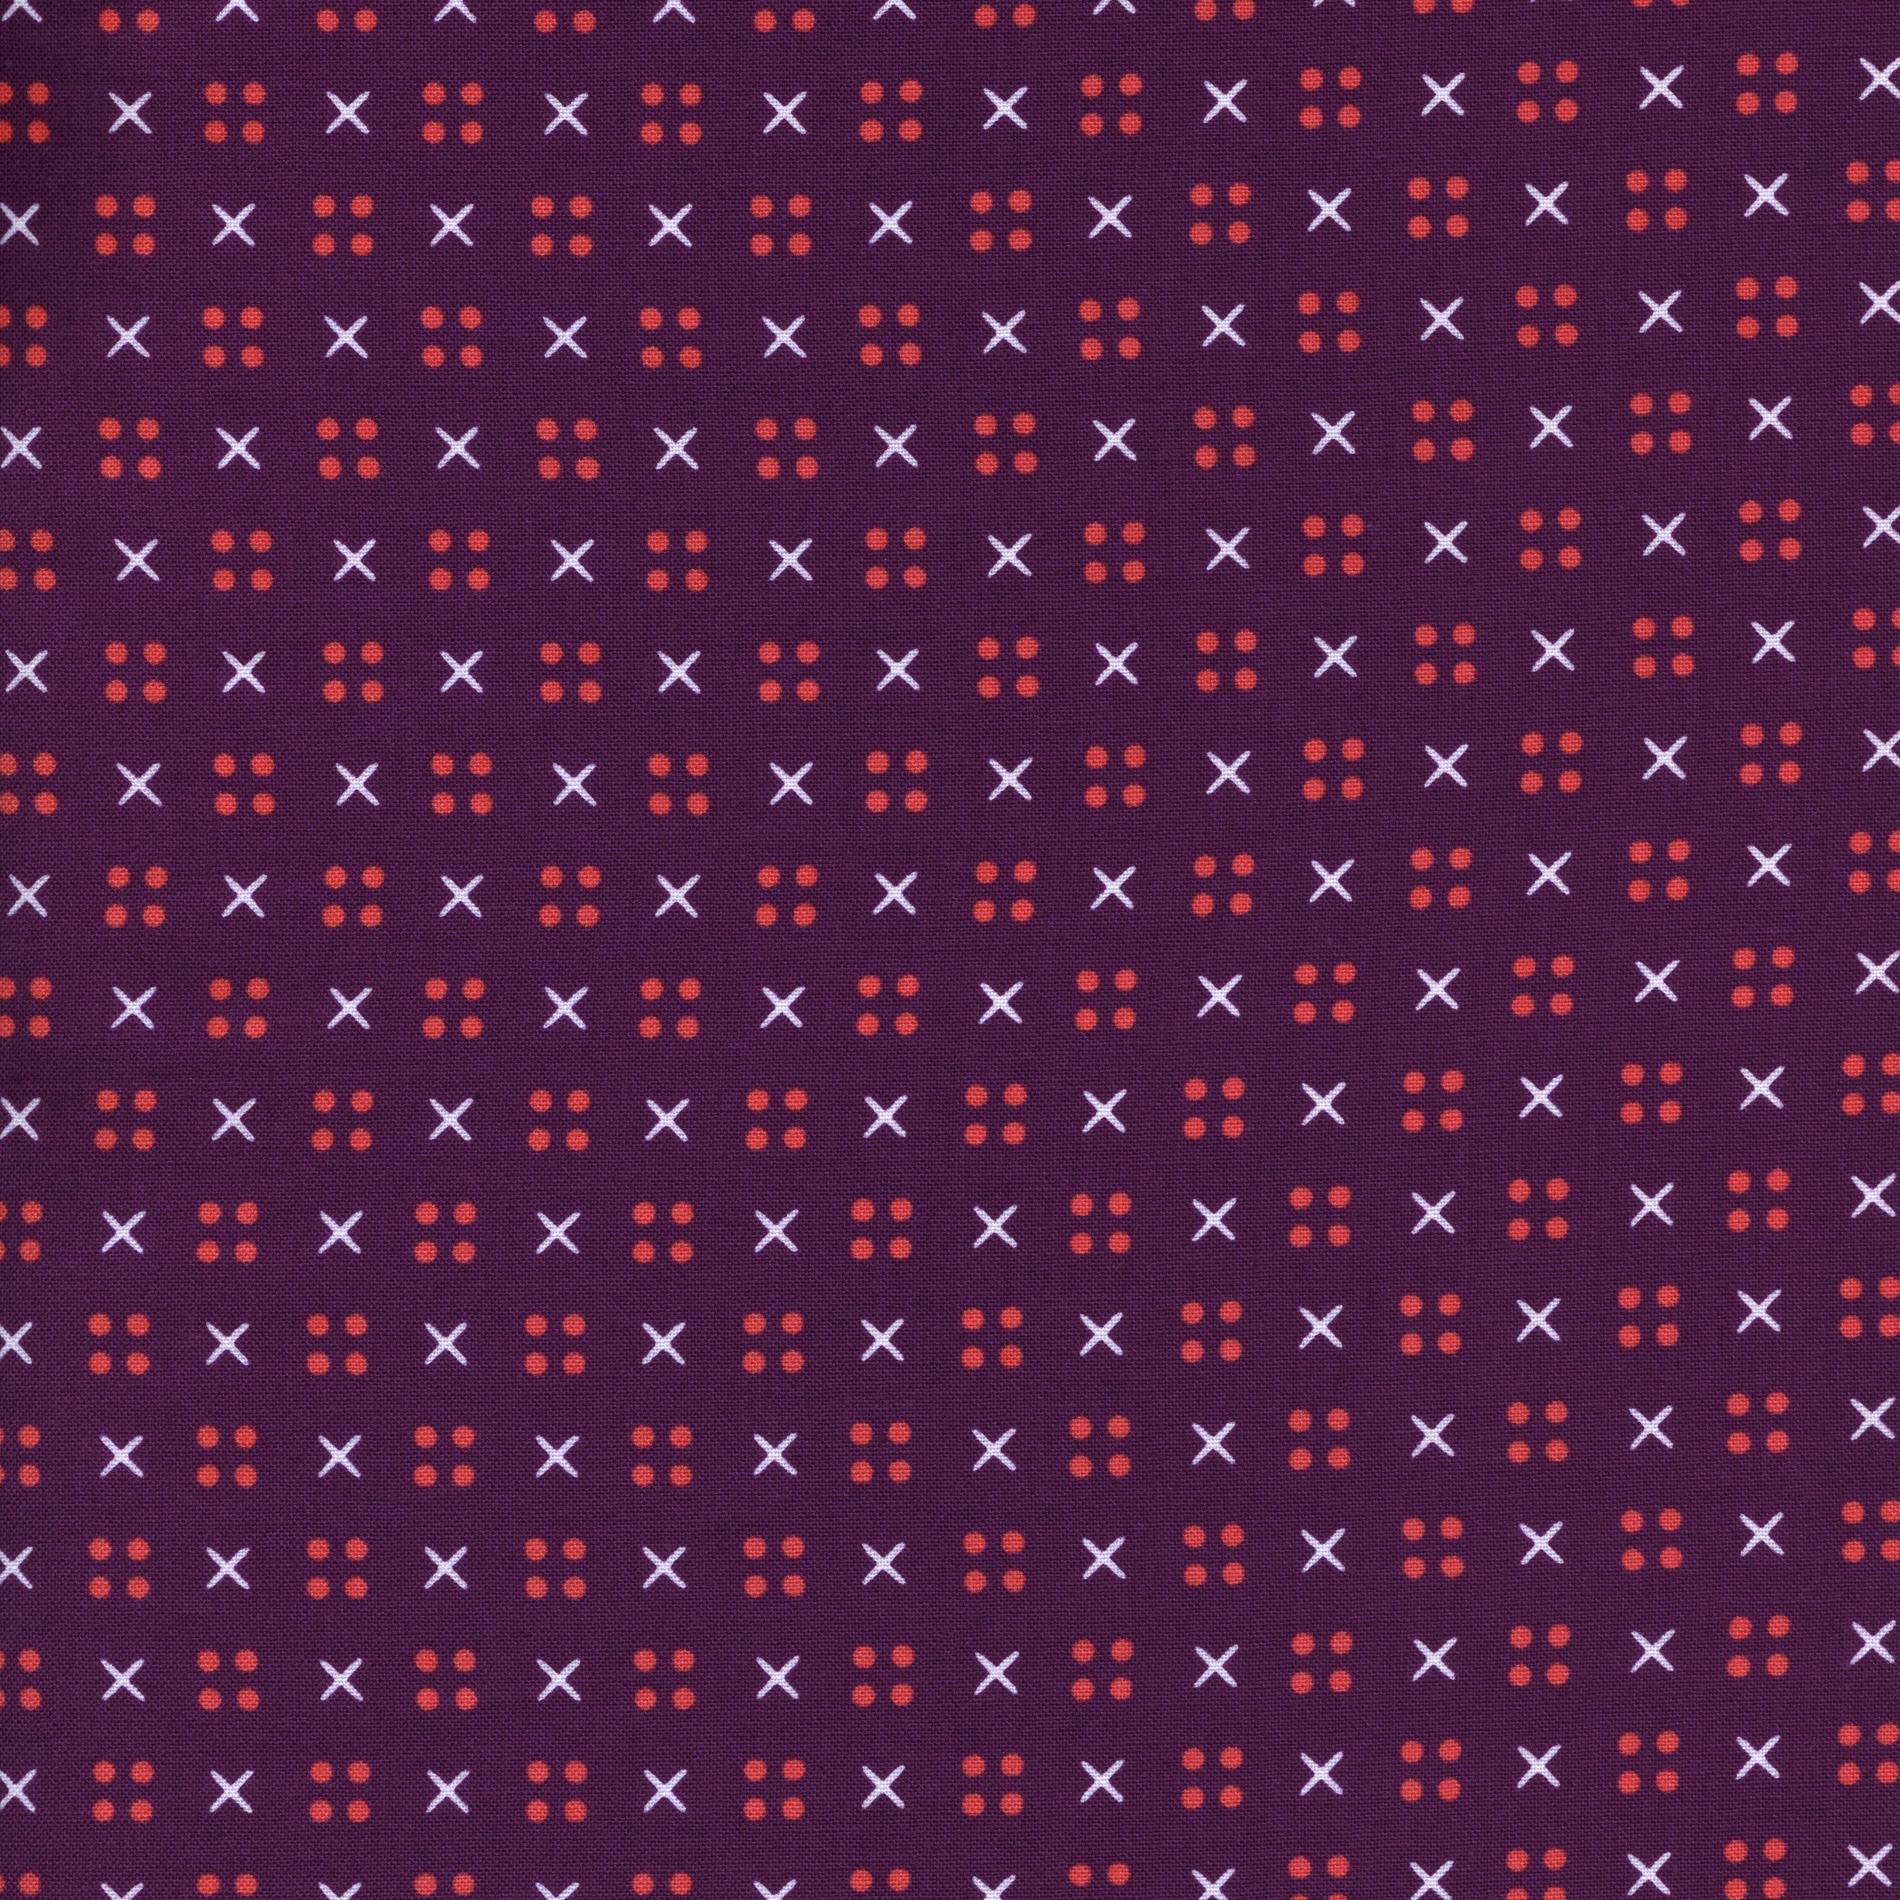 3031-01.Kim.PennyArcade.XDot.Purple